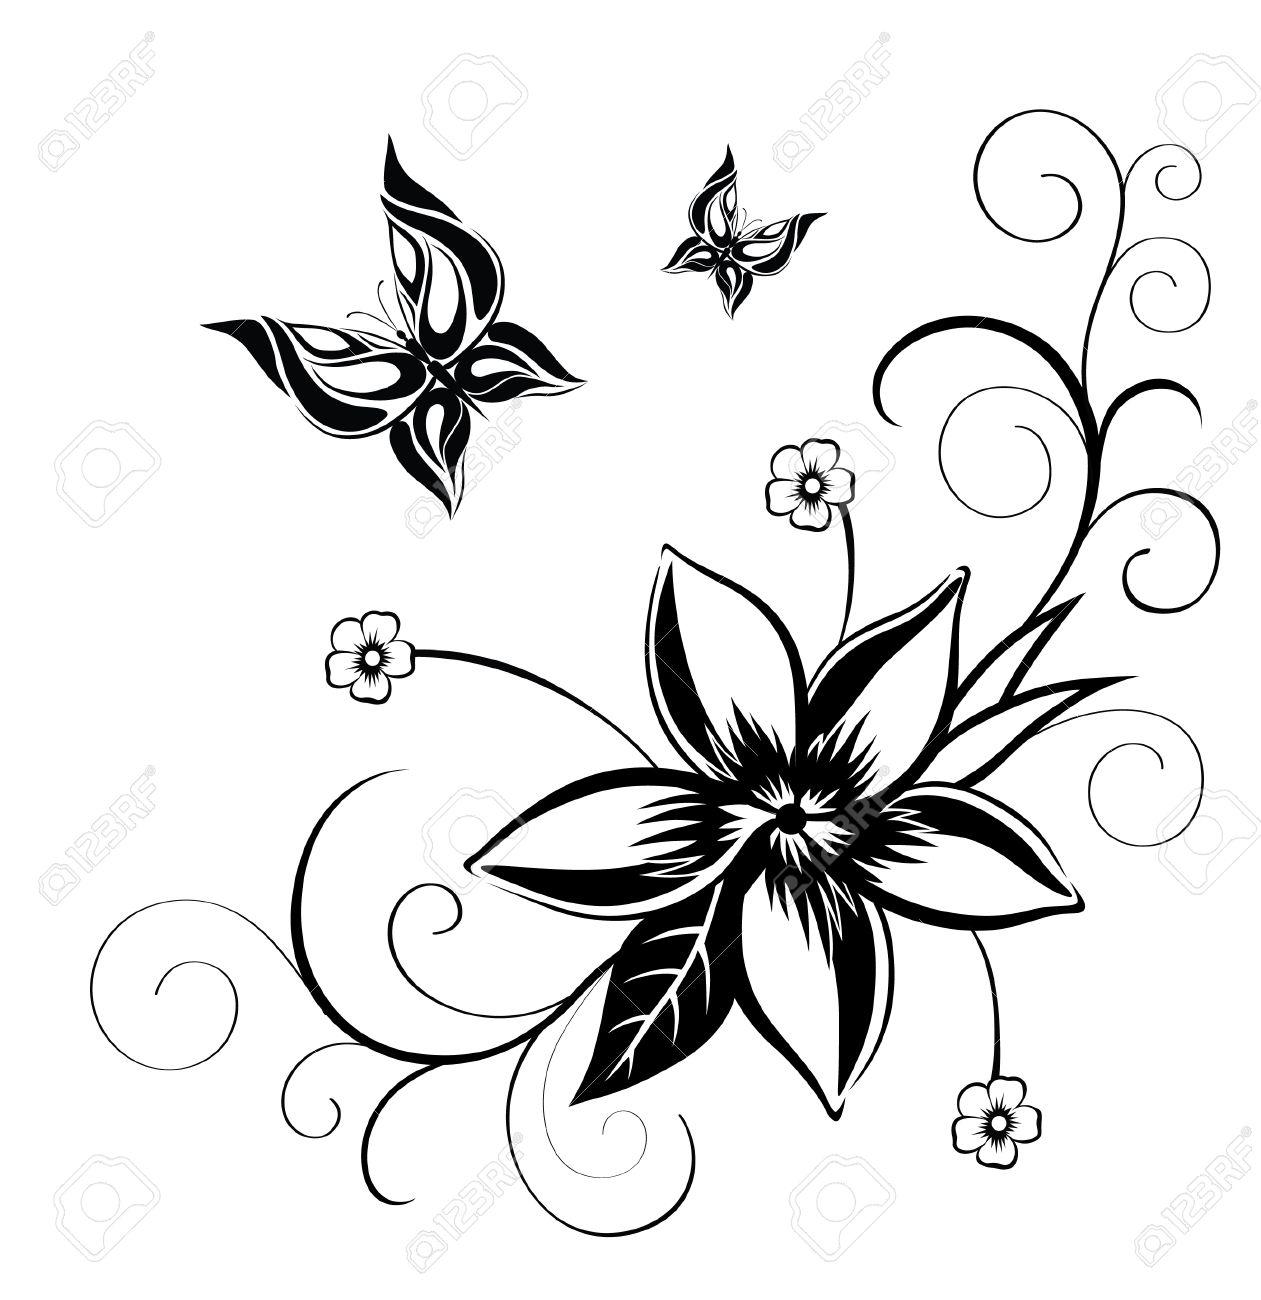 Dibujos De Flores Para Decorar. Mariposa Para Imprimir Dibujos De ...